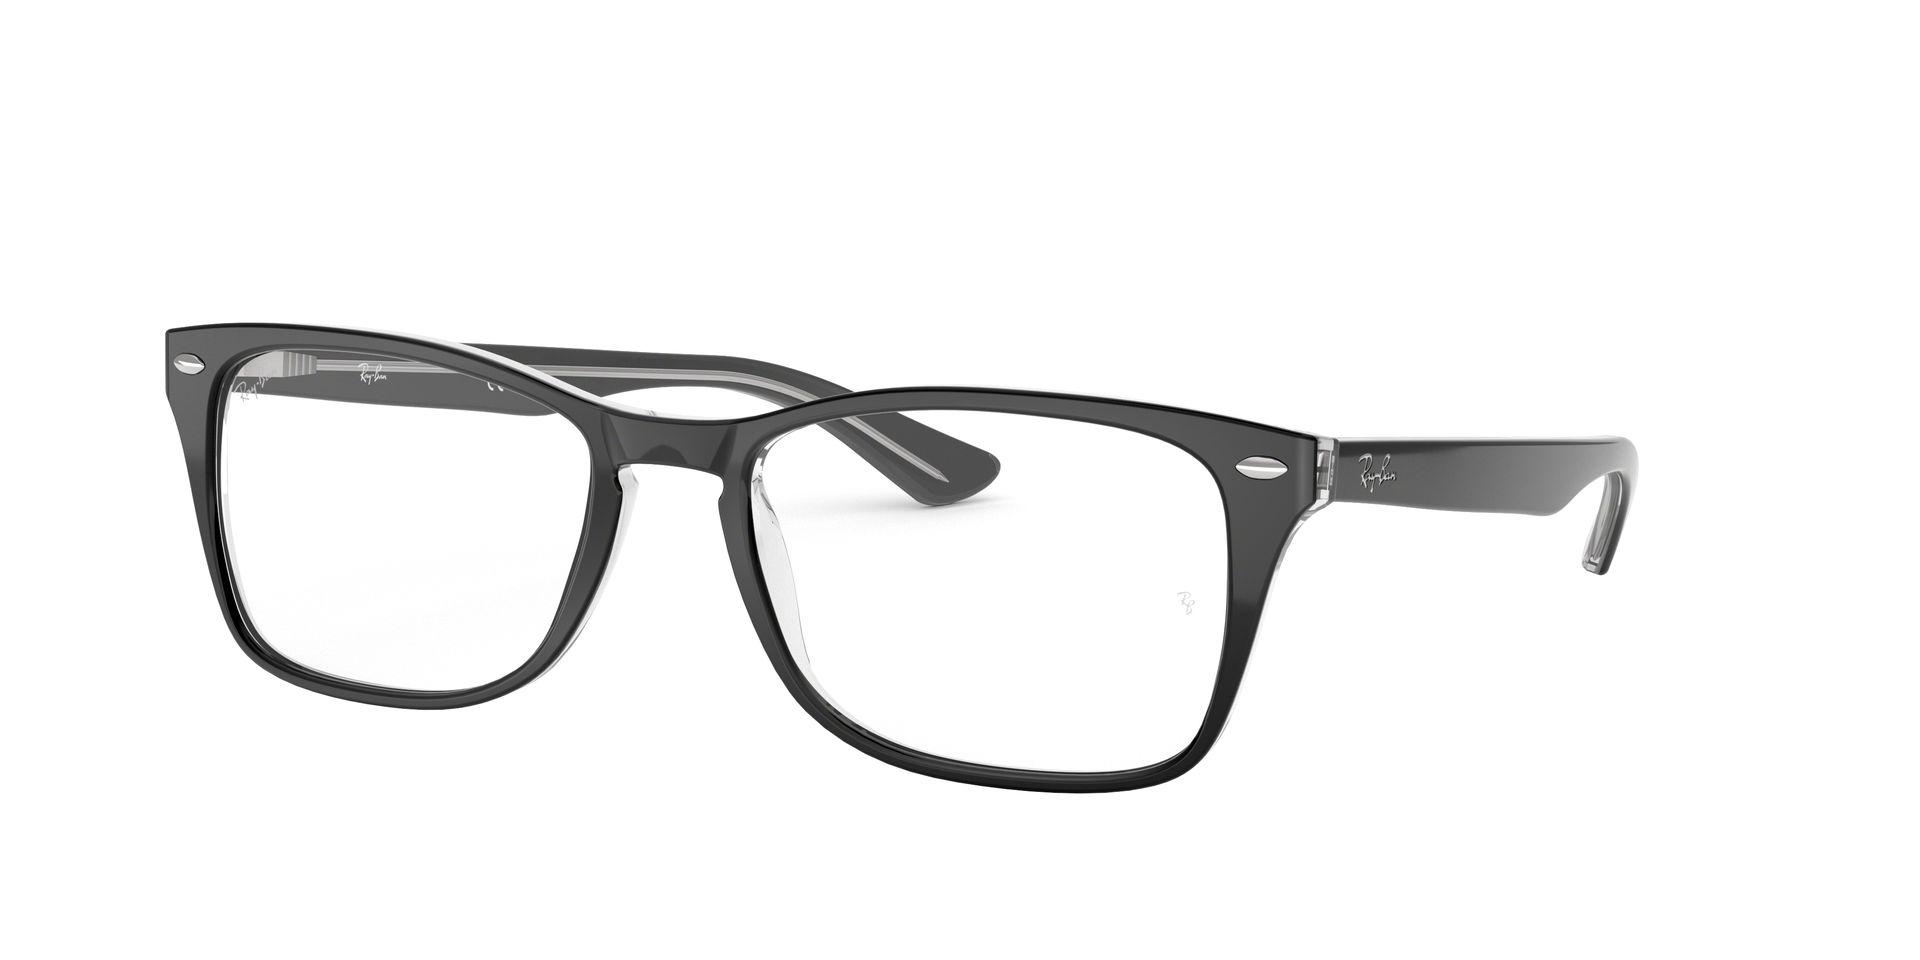 43176c79a0 Ray-Ban RX5228M Eyeglass Frames